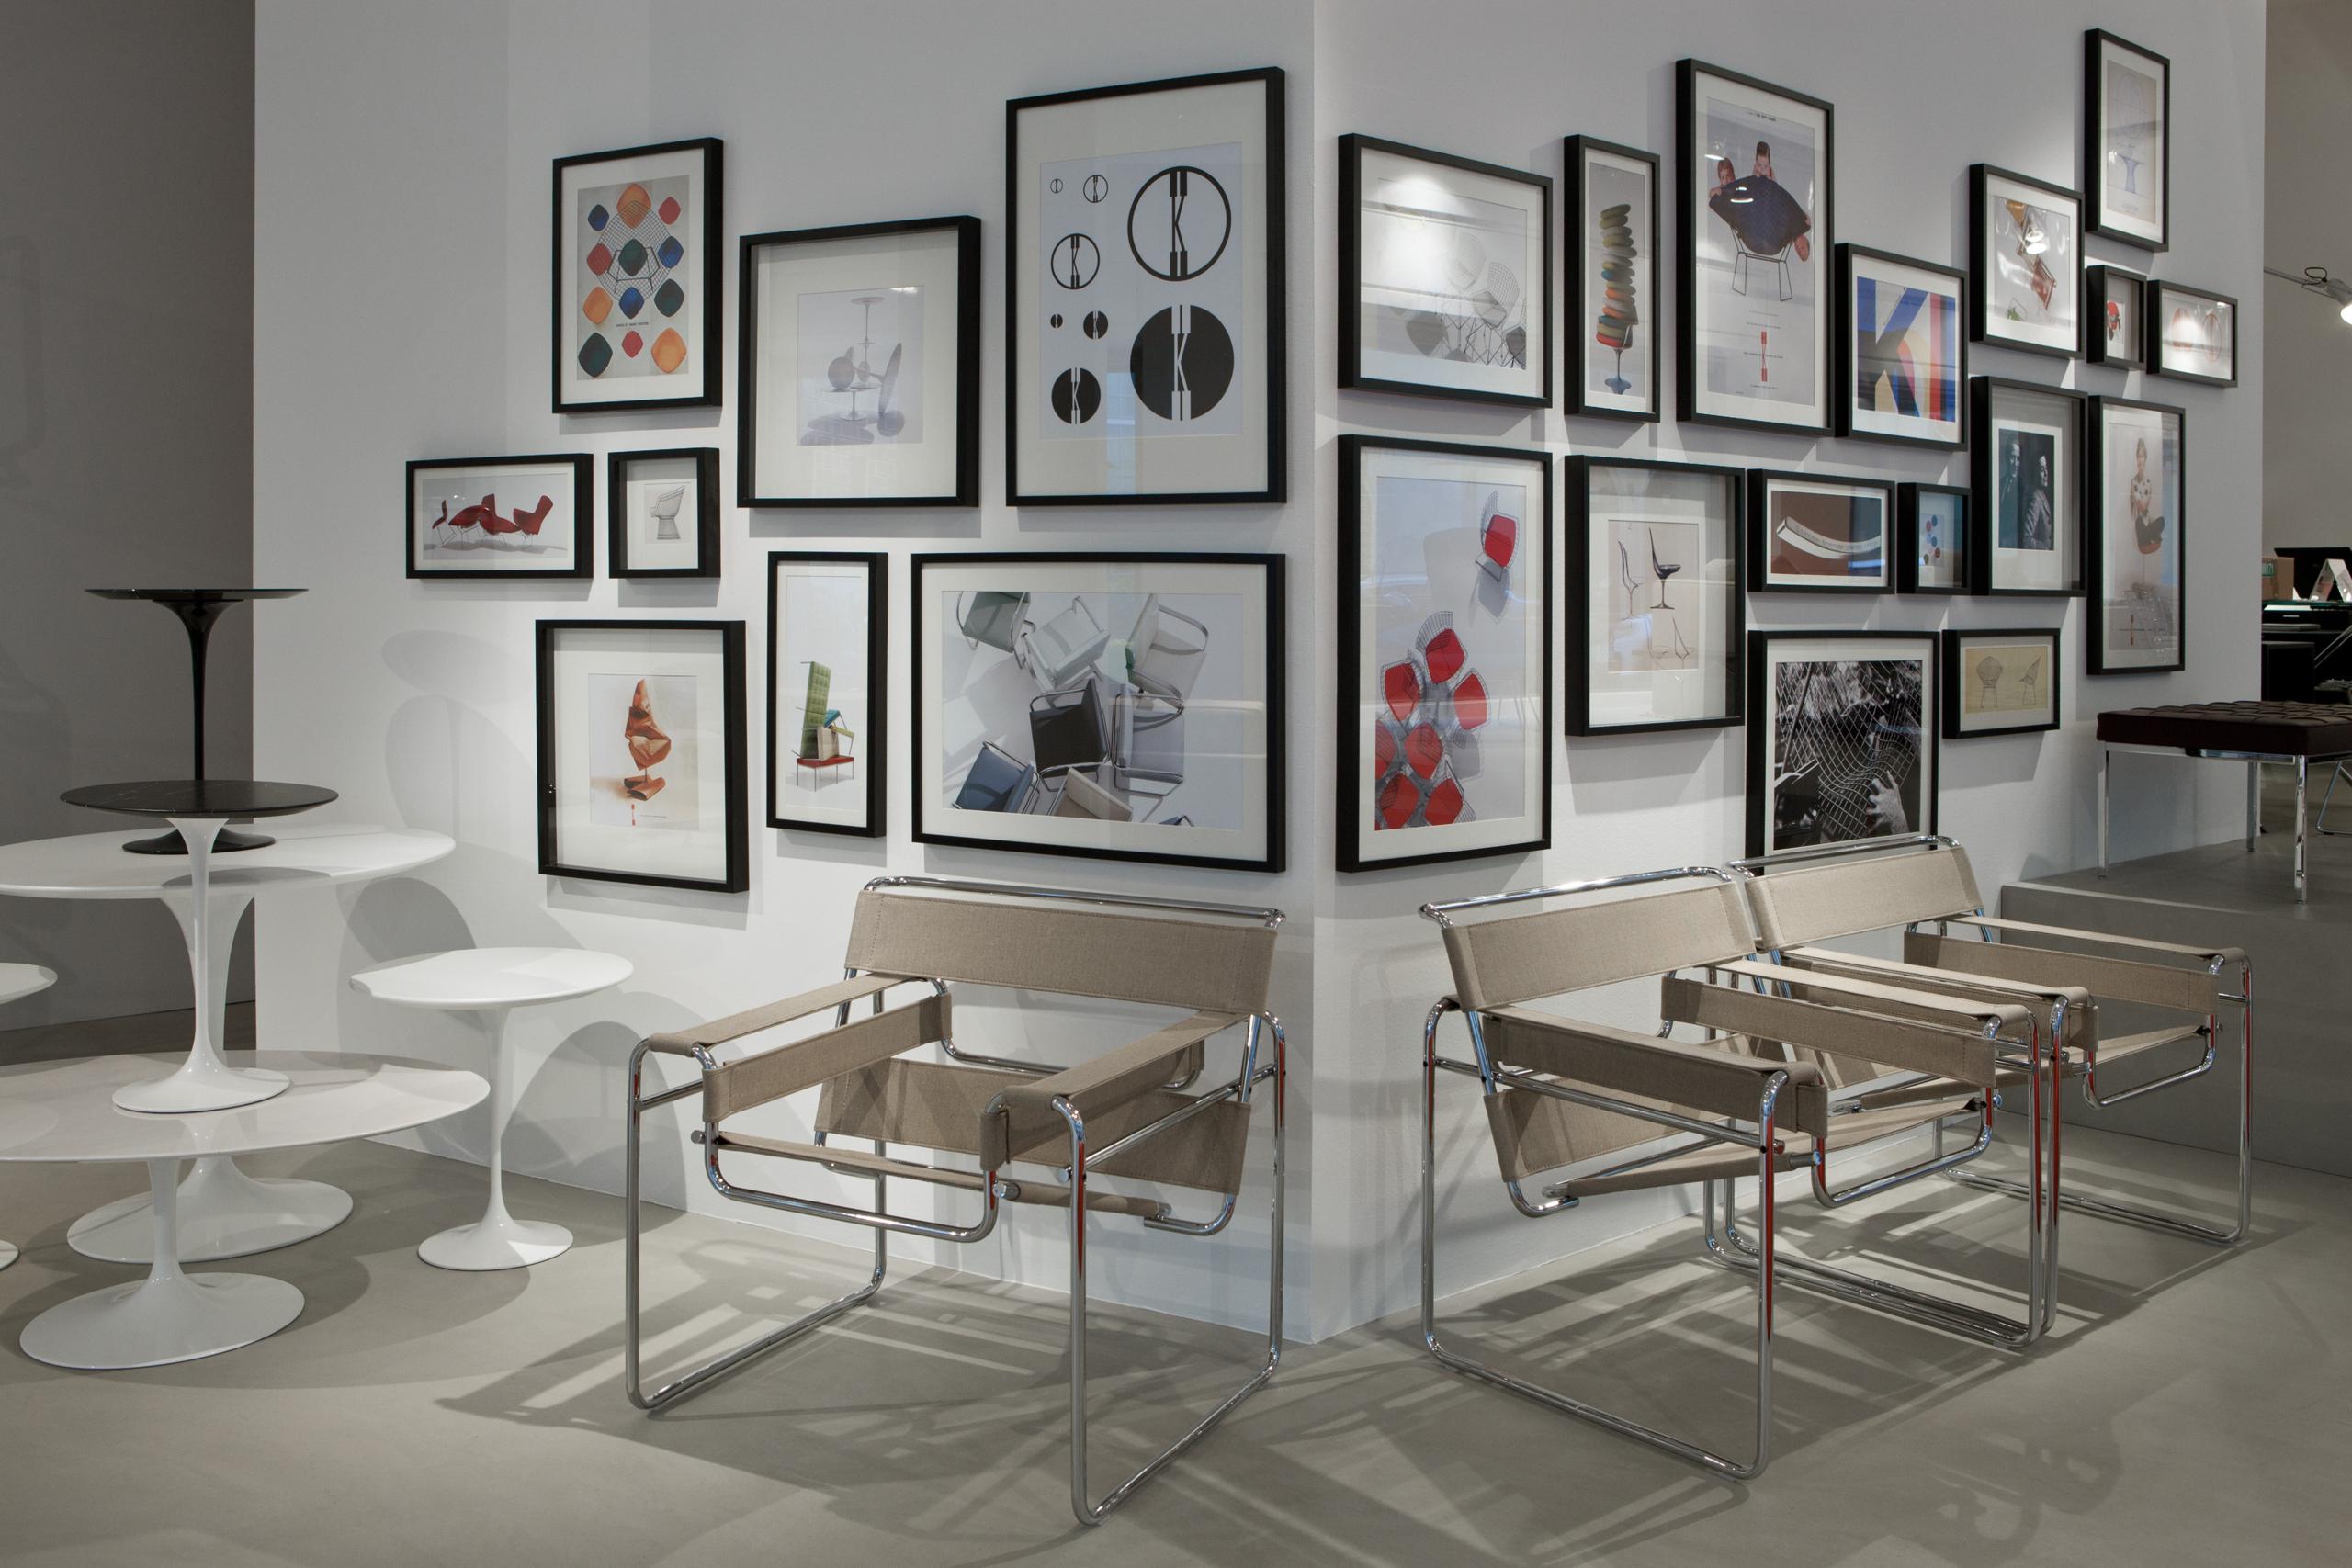 marcel-breuer-designer-dedece